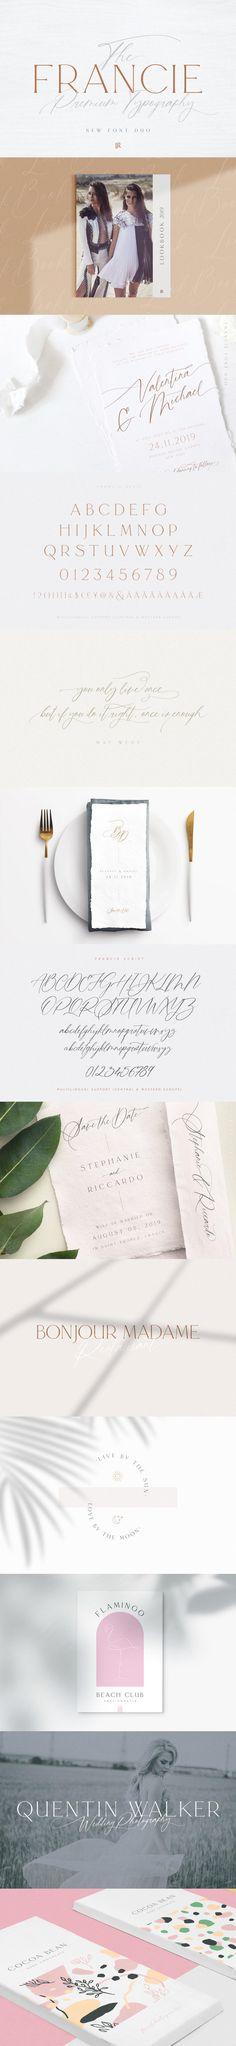 Francie Font Duo #clothing #woff #webopenfontformat #ttf #logo #webopenfontformat #truetypefont #truetypefont #WeddingFont #handwritten #ttf #highfashion #magazine #branding #fashion #fontduo #wordmark #LogoType #alphabet Calligraphy Fonts, Typography Fonts, Typography Design, Lettering, Feminine Fonts, Elegant Fonts, Modern Font, Open Fonts, Font Design